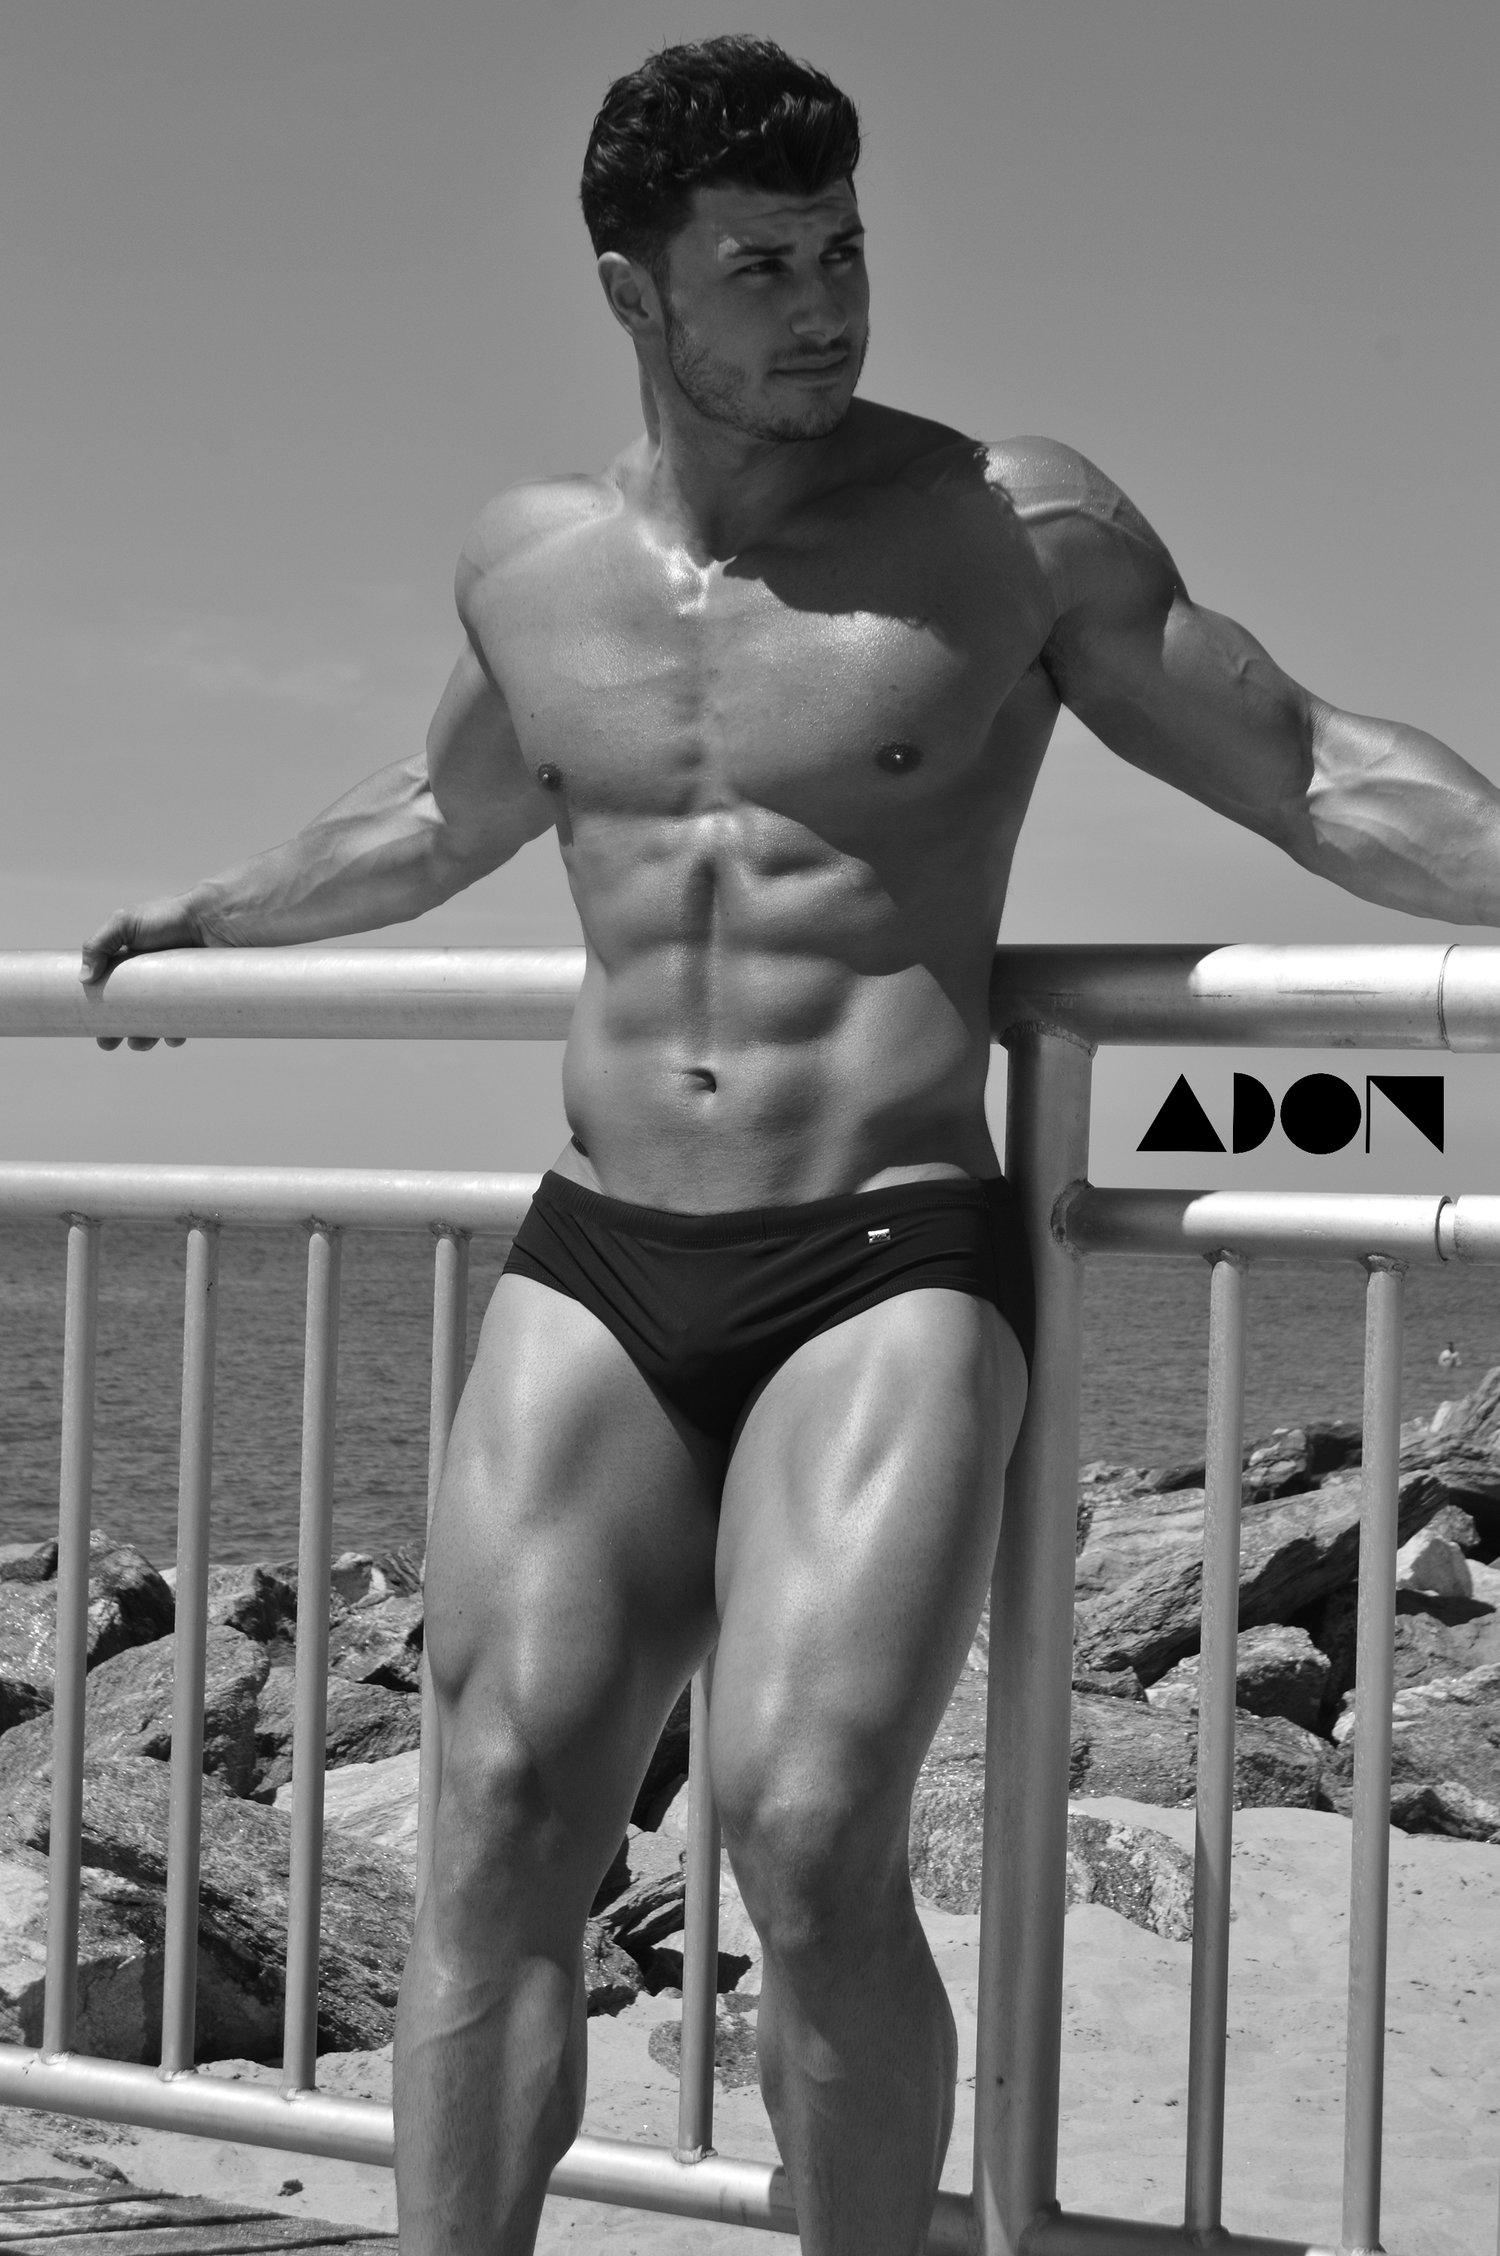 Adon Exclusive: Model Joe Calabrese By Price Brendon